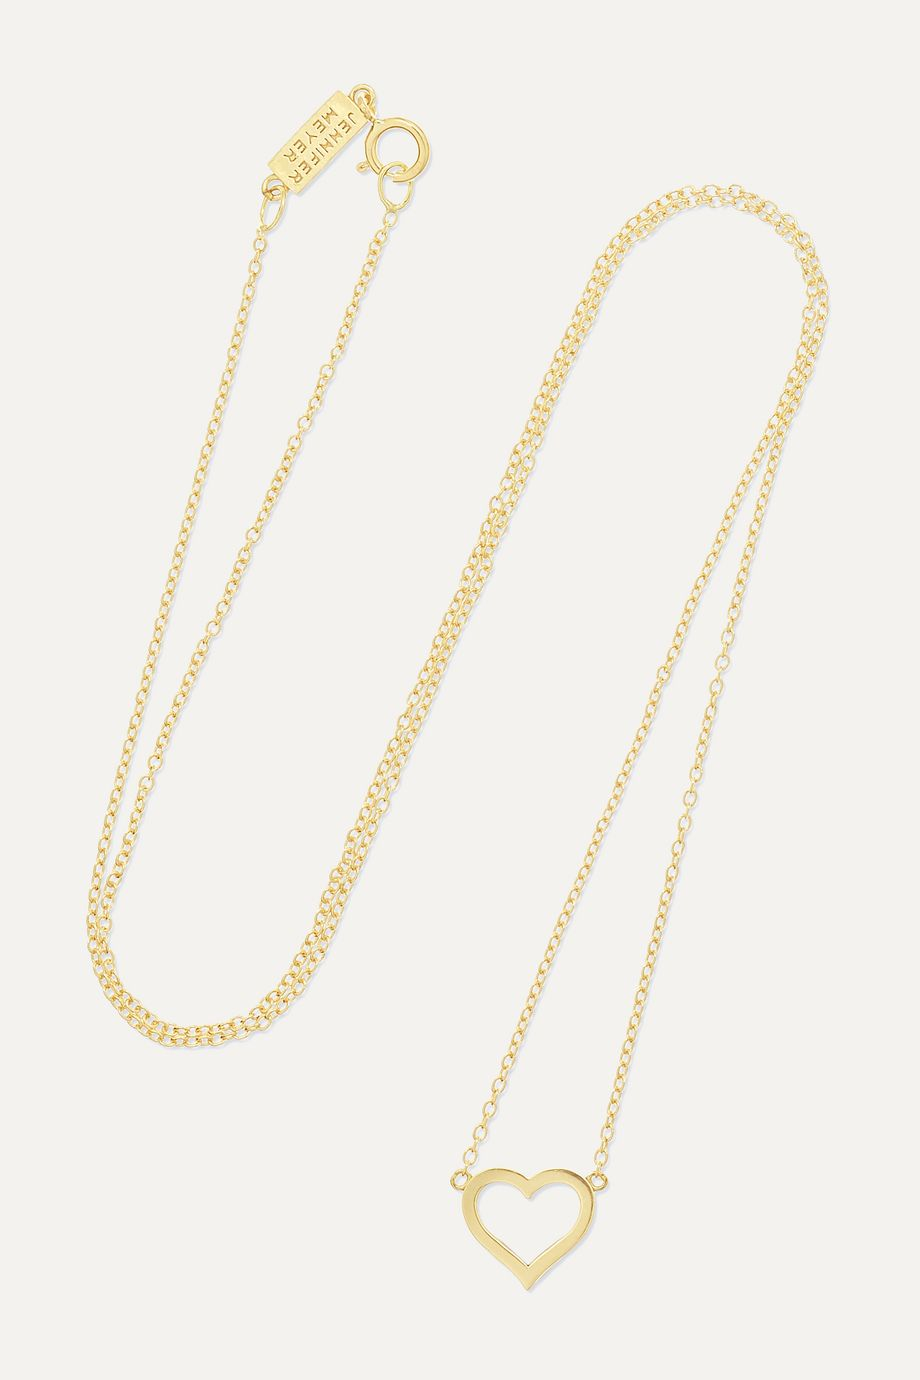 Jennifer Meyer Small Open Heart 18-karat gold necklace